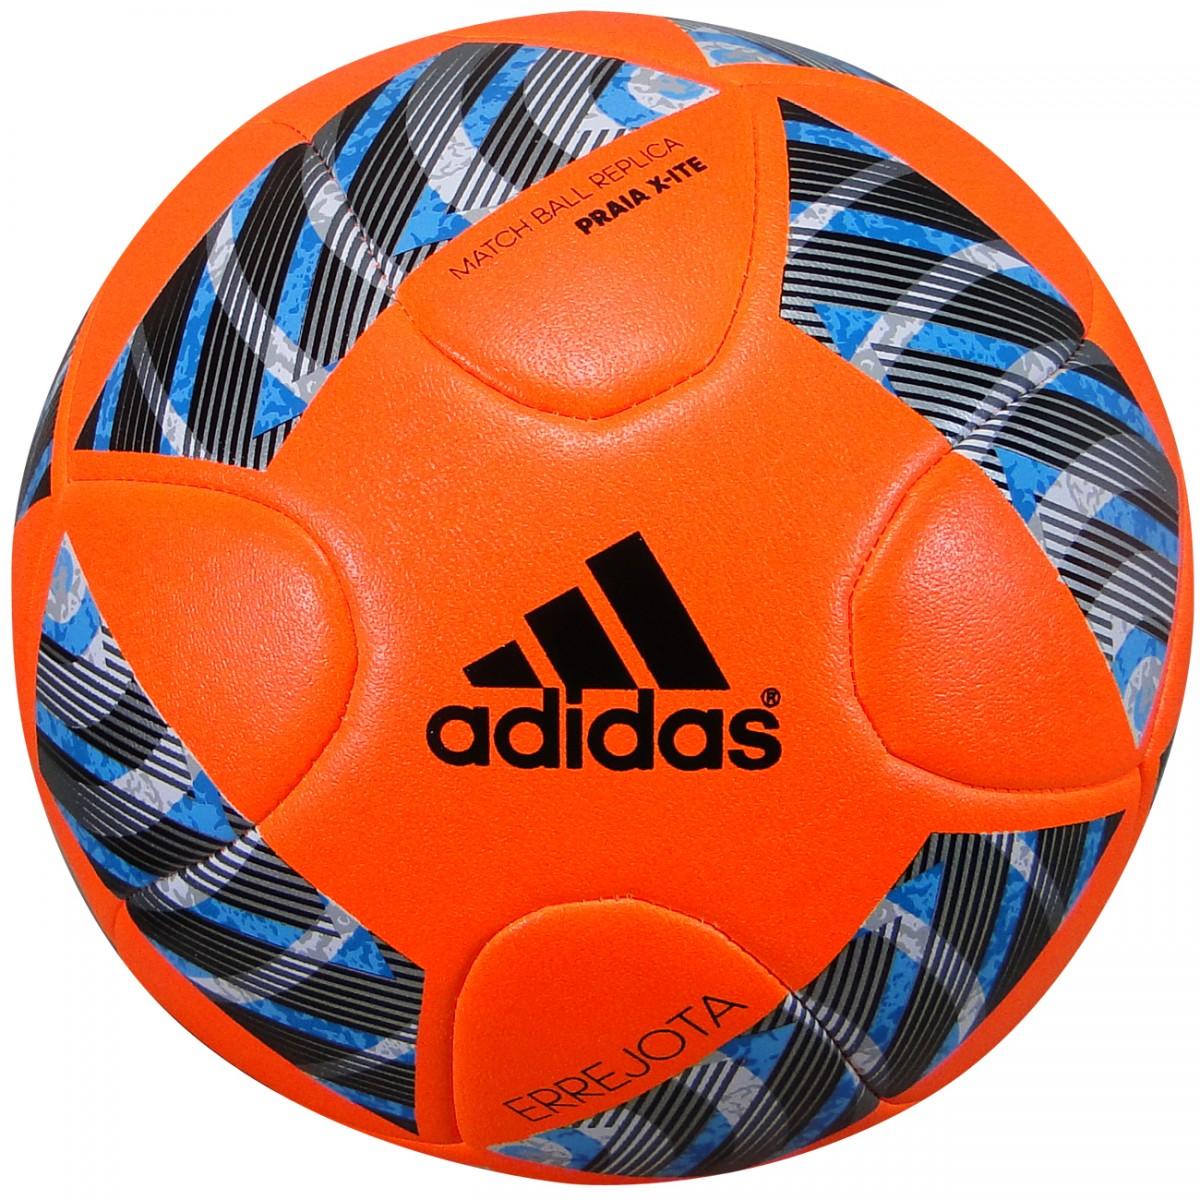 Bola Adidas Praia Xite AO4030 - Laranja Preto - Chuteira Nike ... b2de79fe3ad32